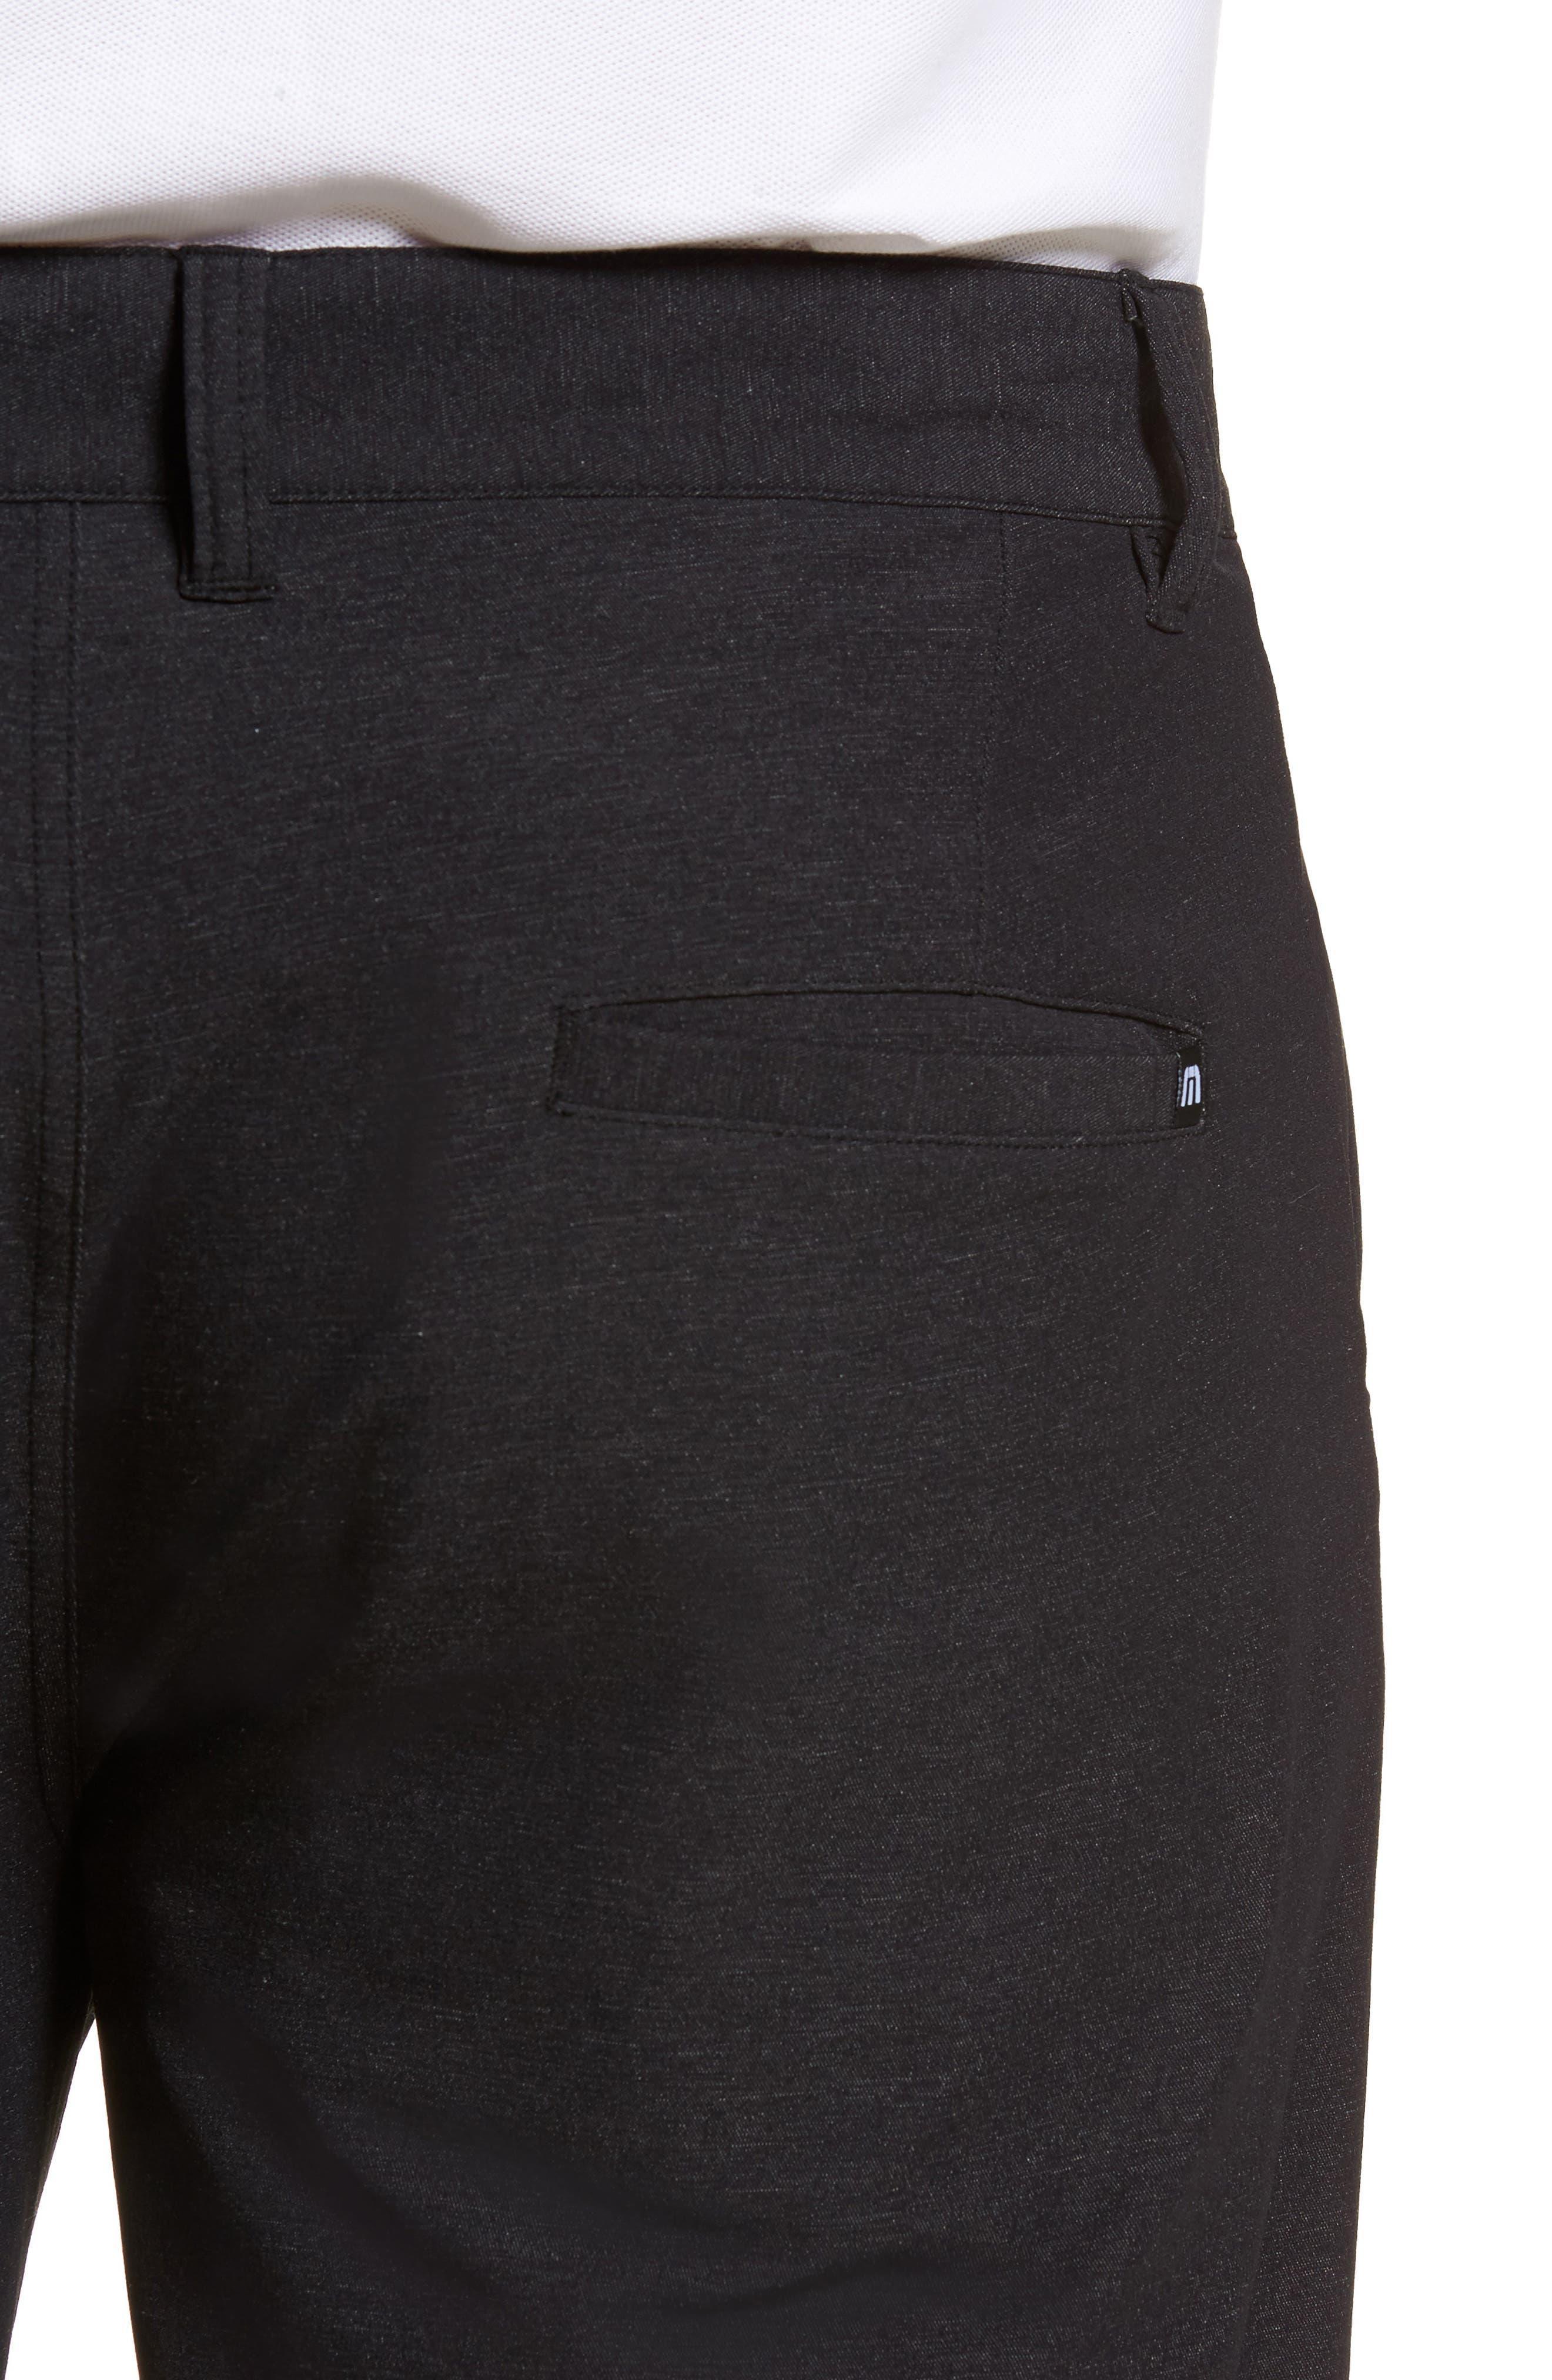 Mercurio Regular Fit Four-Way Stretch Pants,                             Alternate thumbnail 4, color,                             HEATHER BLACK